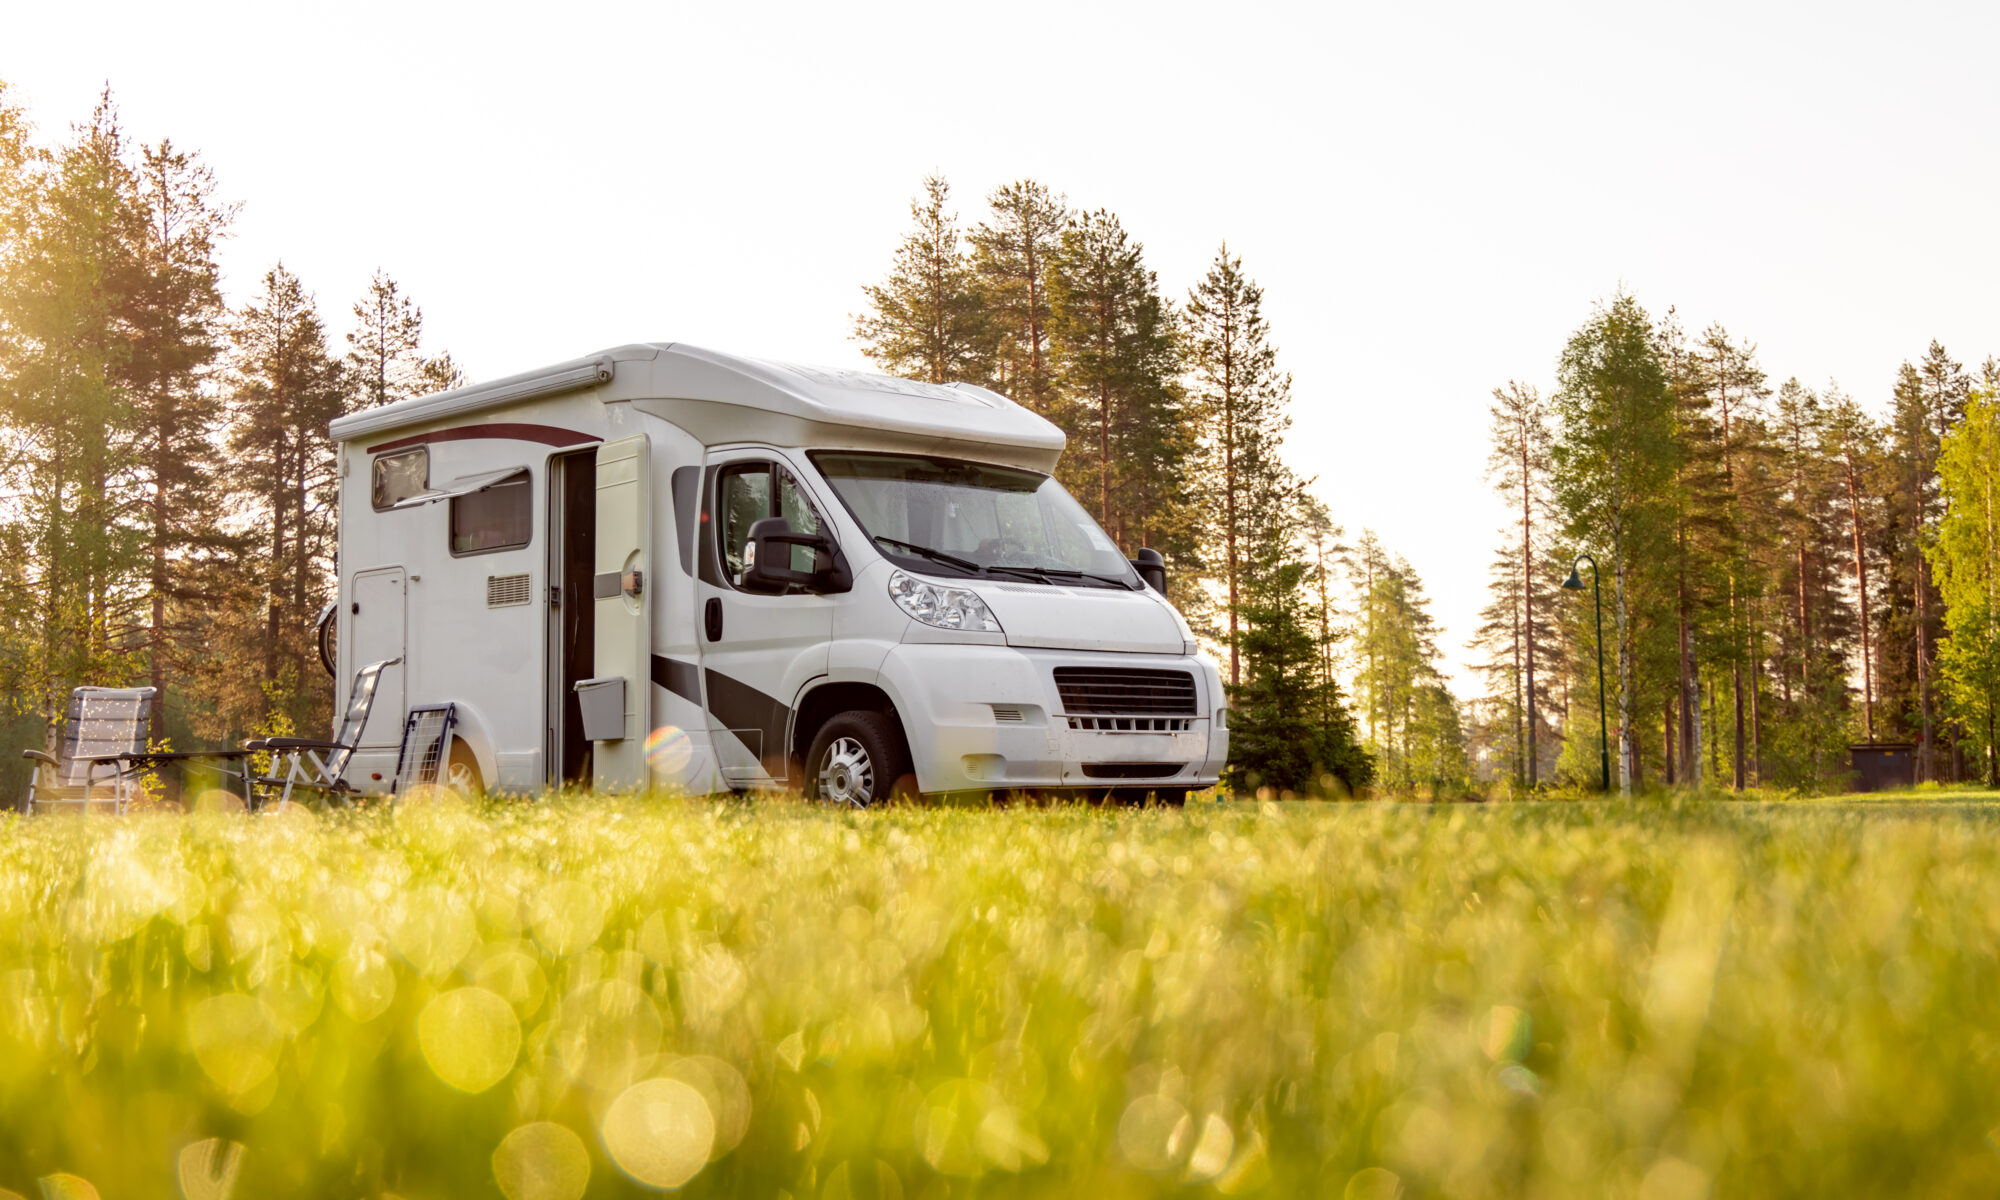 A class B camper van in a meadow